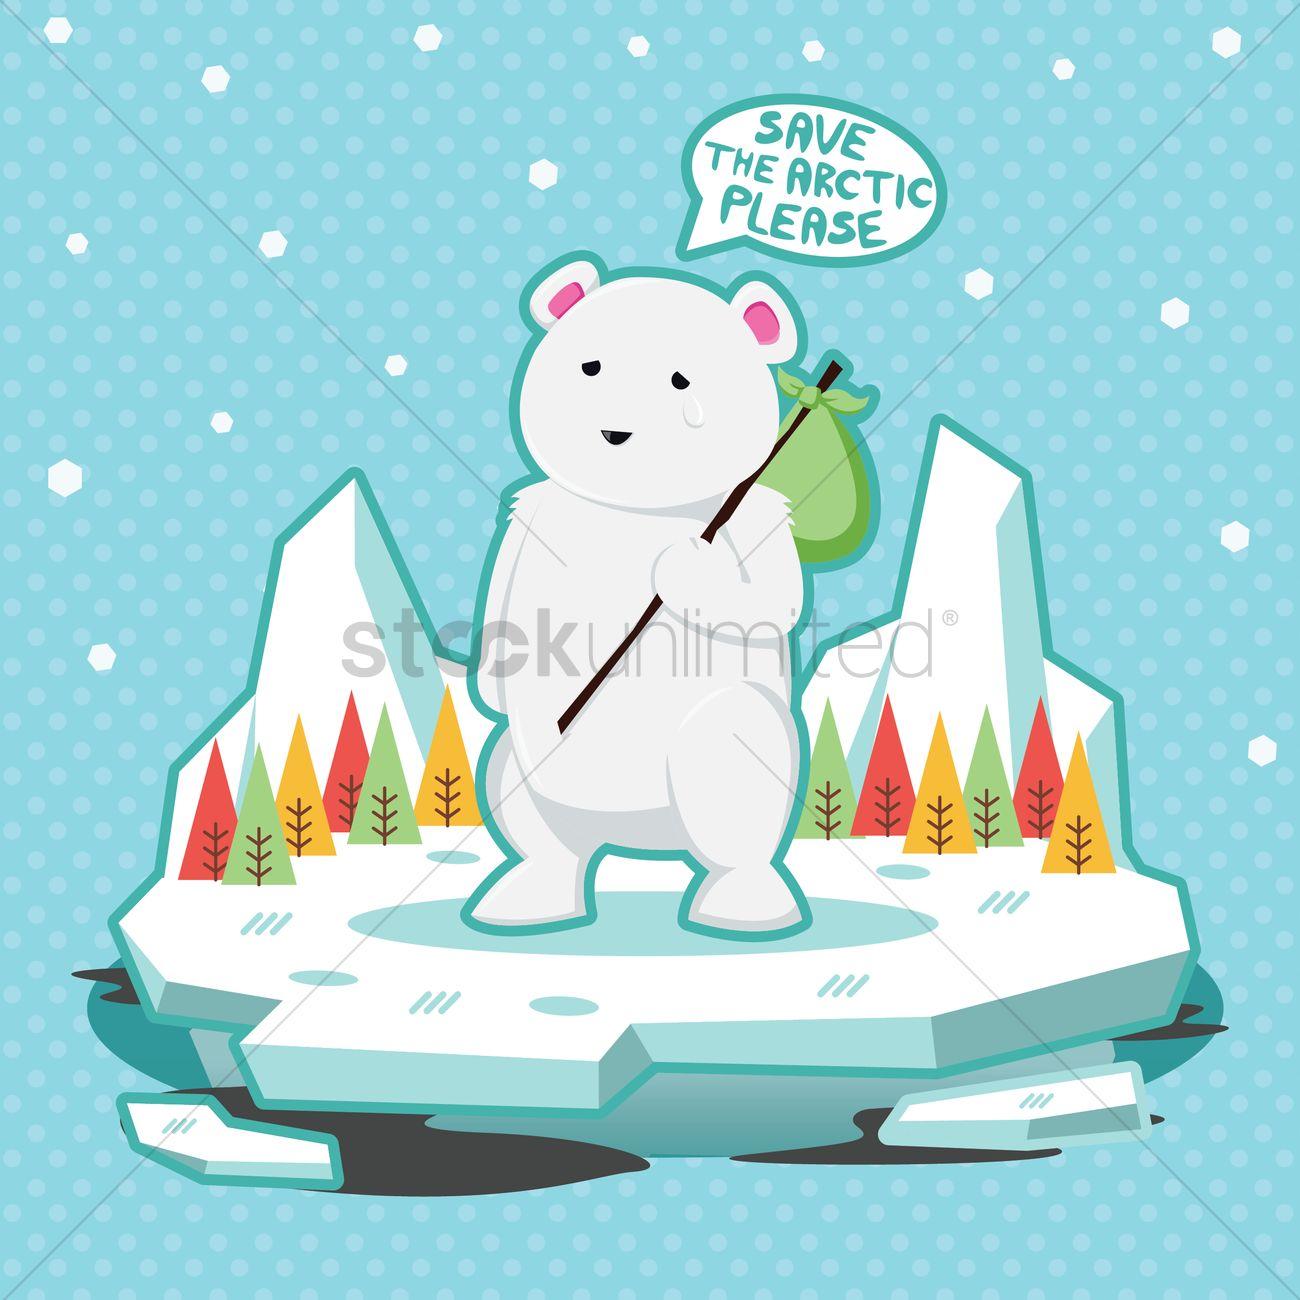 Global warming concept with polar bear Vector Image.